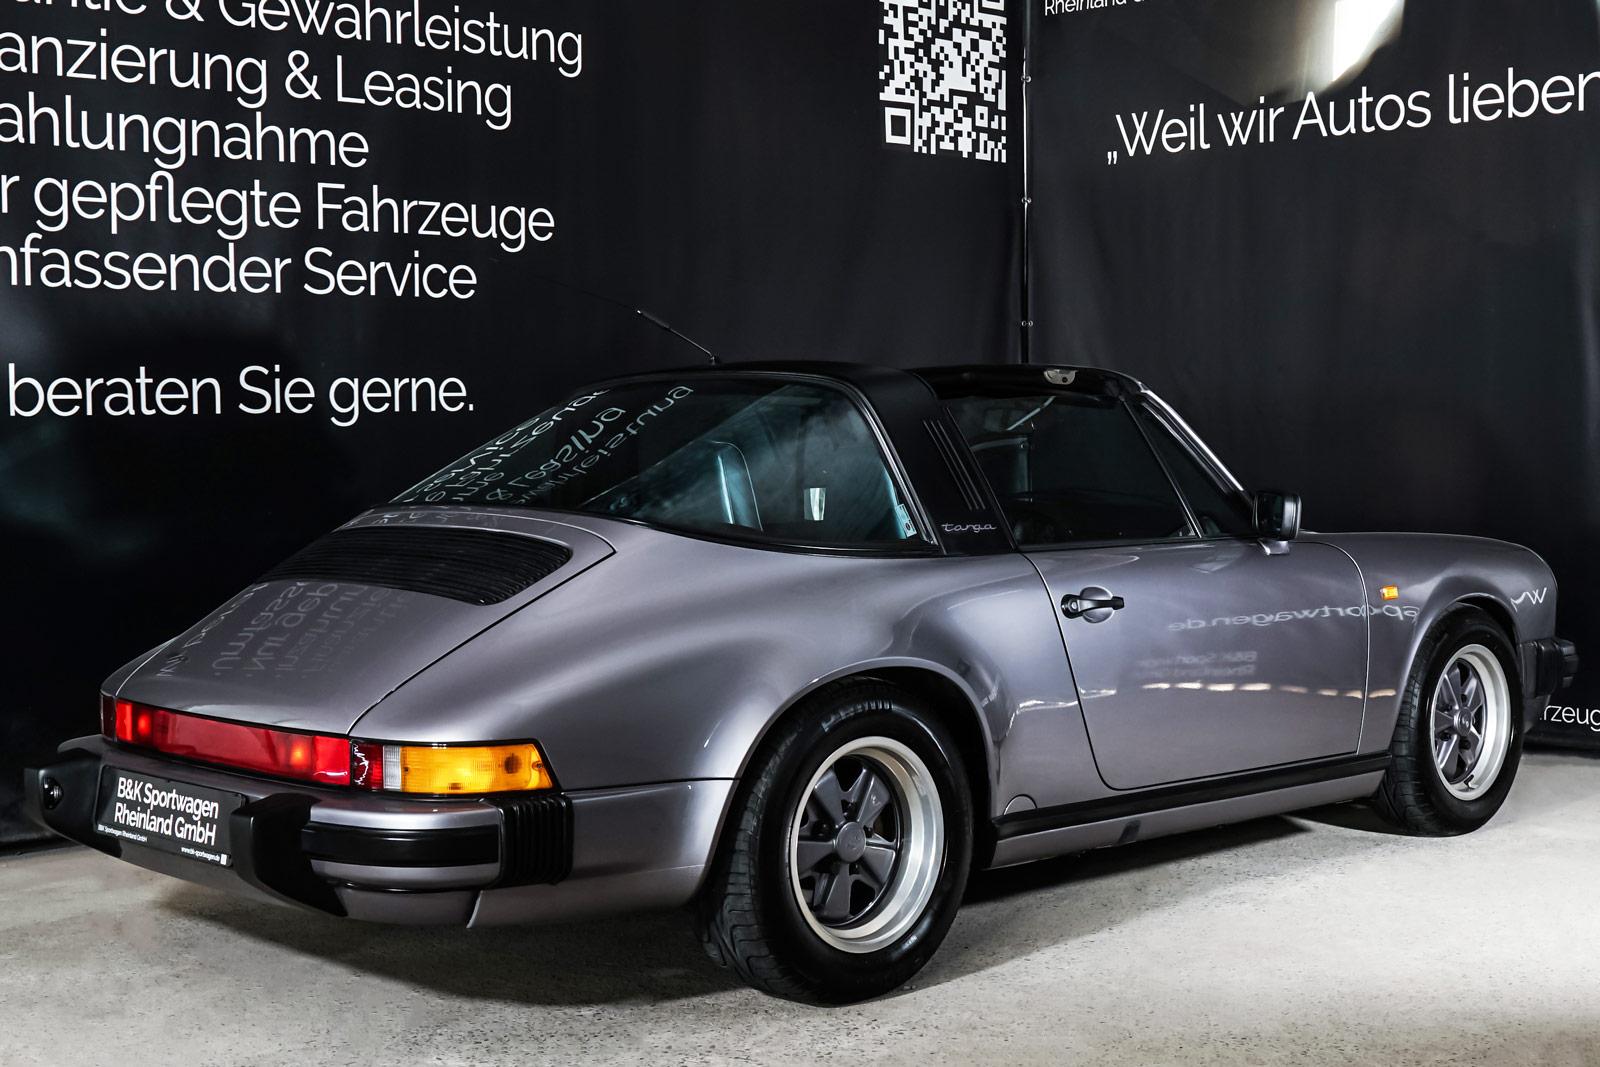 Porsche_911_Targa_Diamantblaumetallic_Blau_POR-0092_18_w